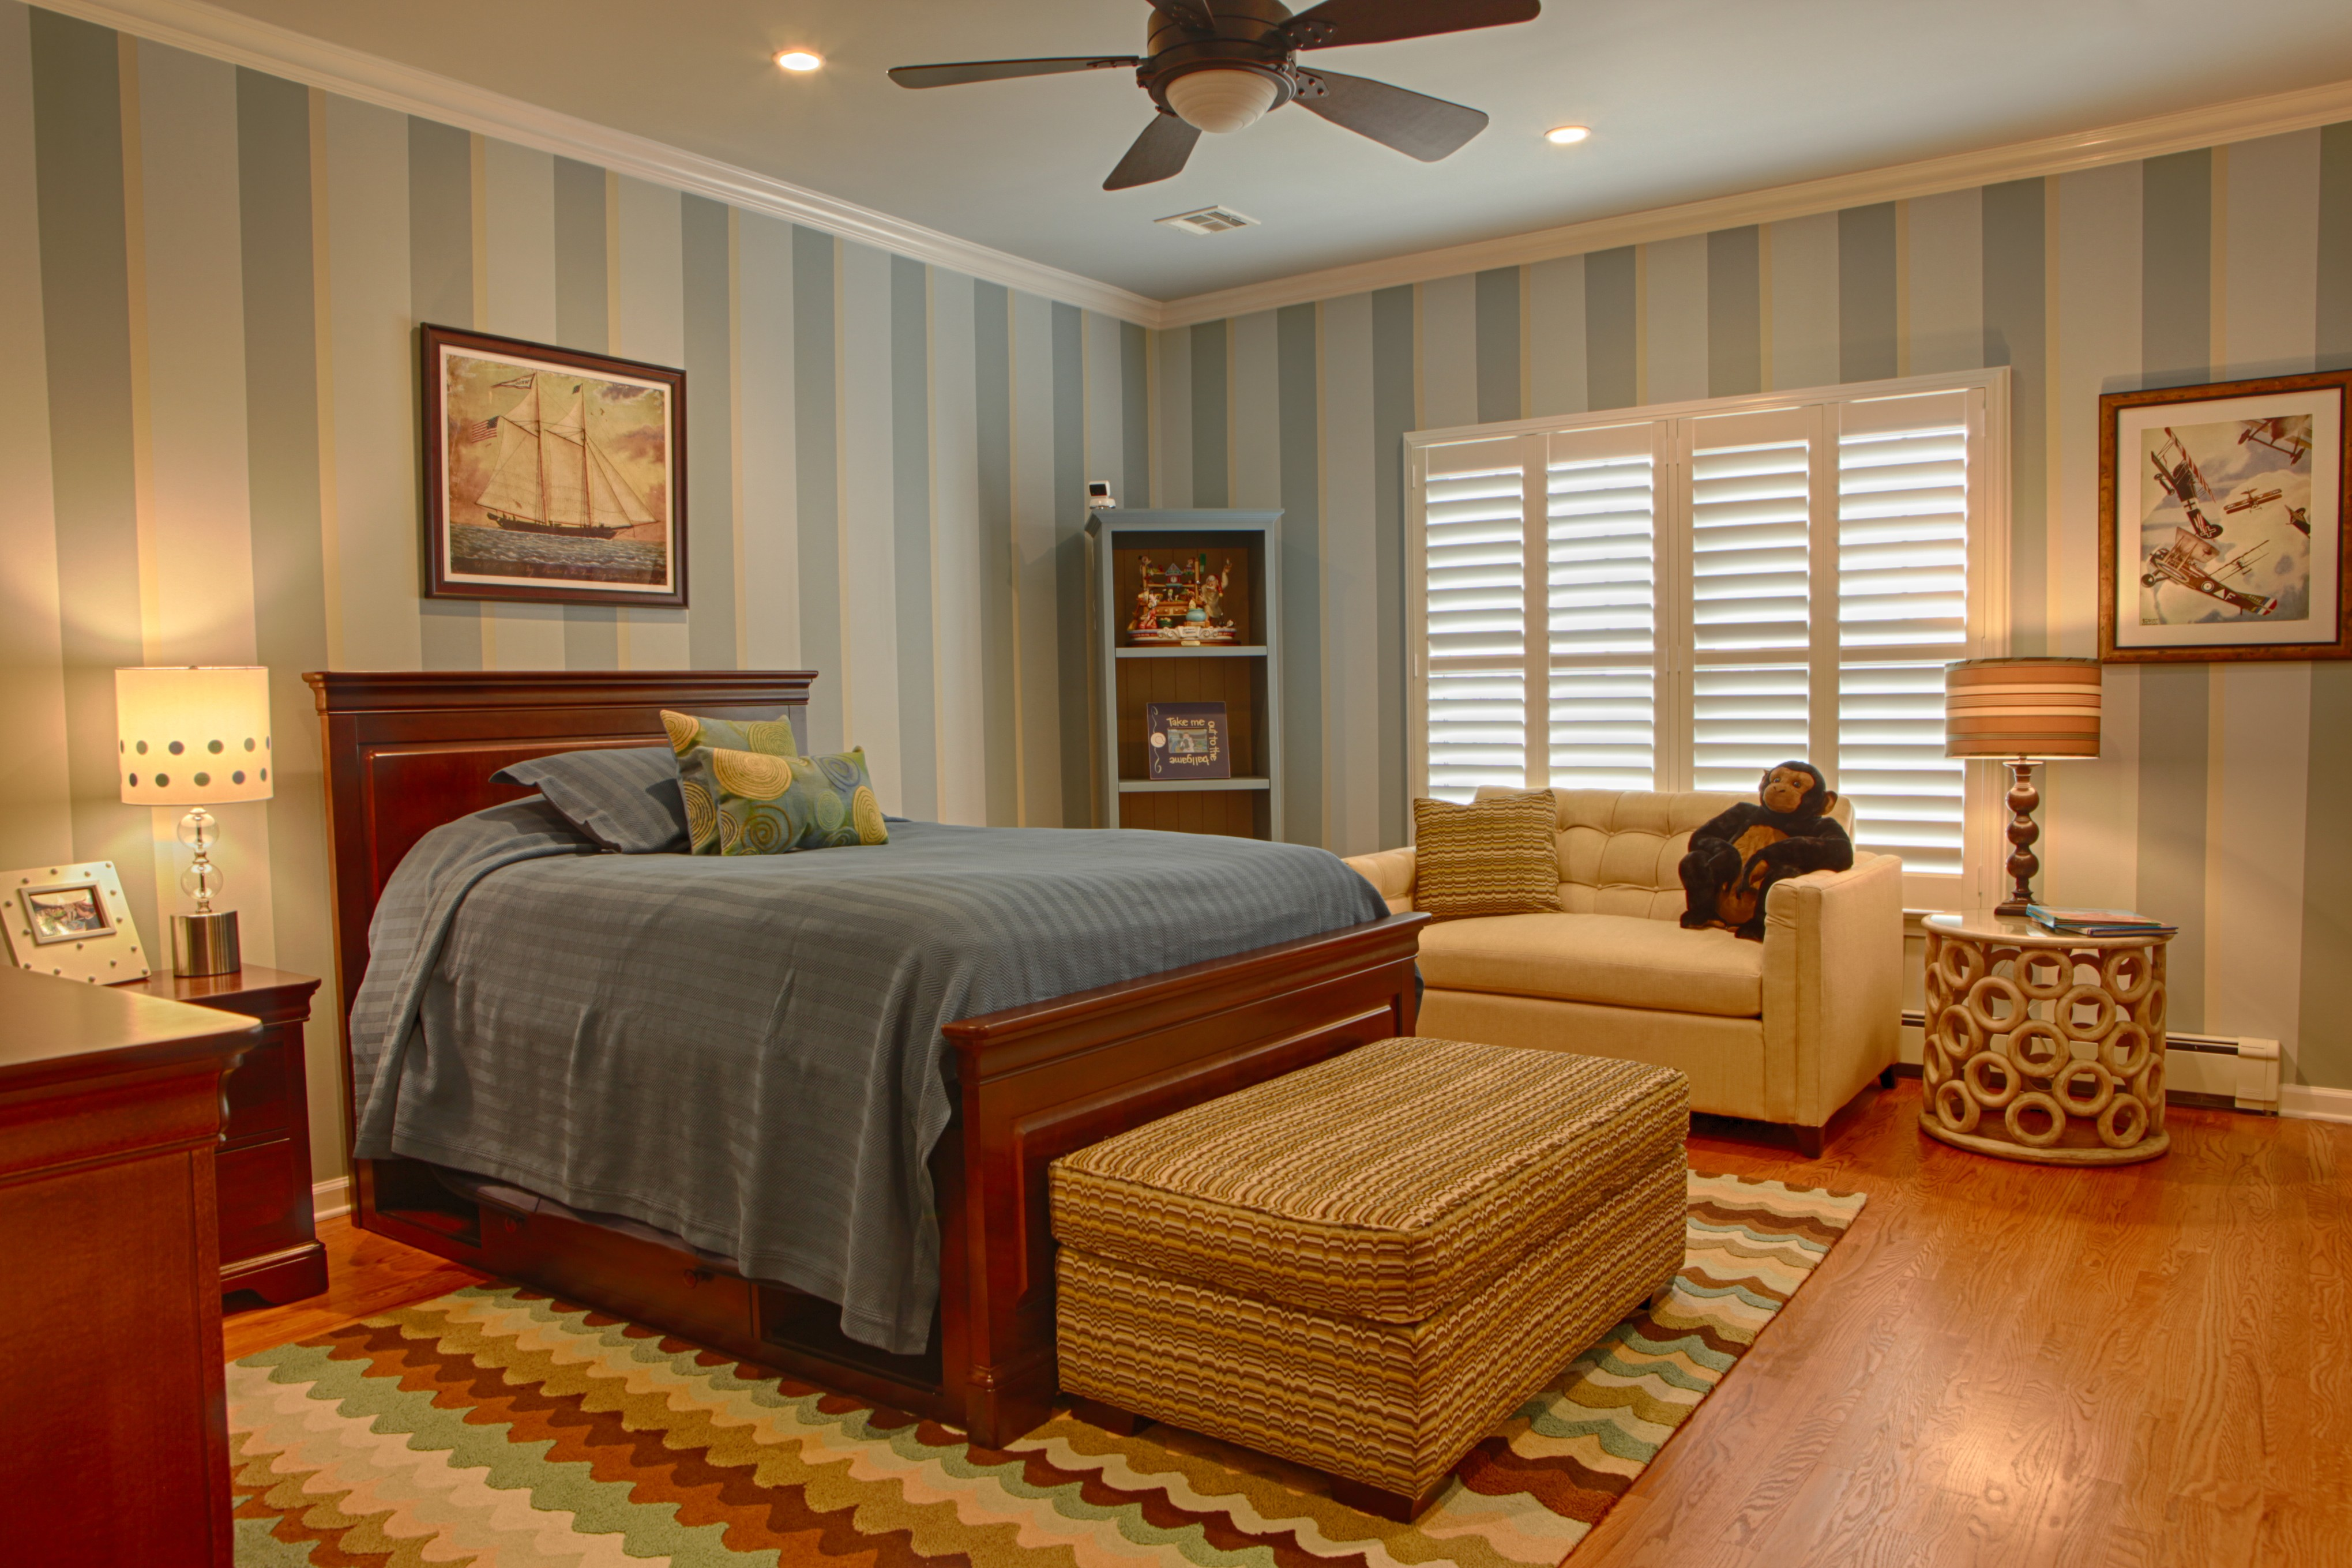 13 amazing diy bedroom d cor ideas diy home decor - Apartment interior design ideas with black woven light fixtures ...